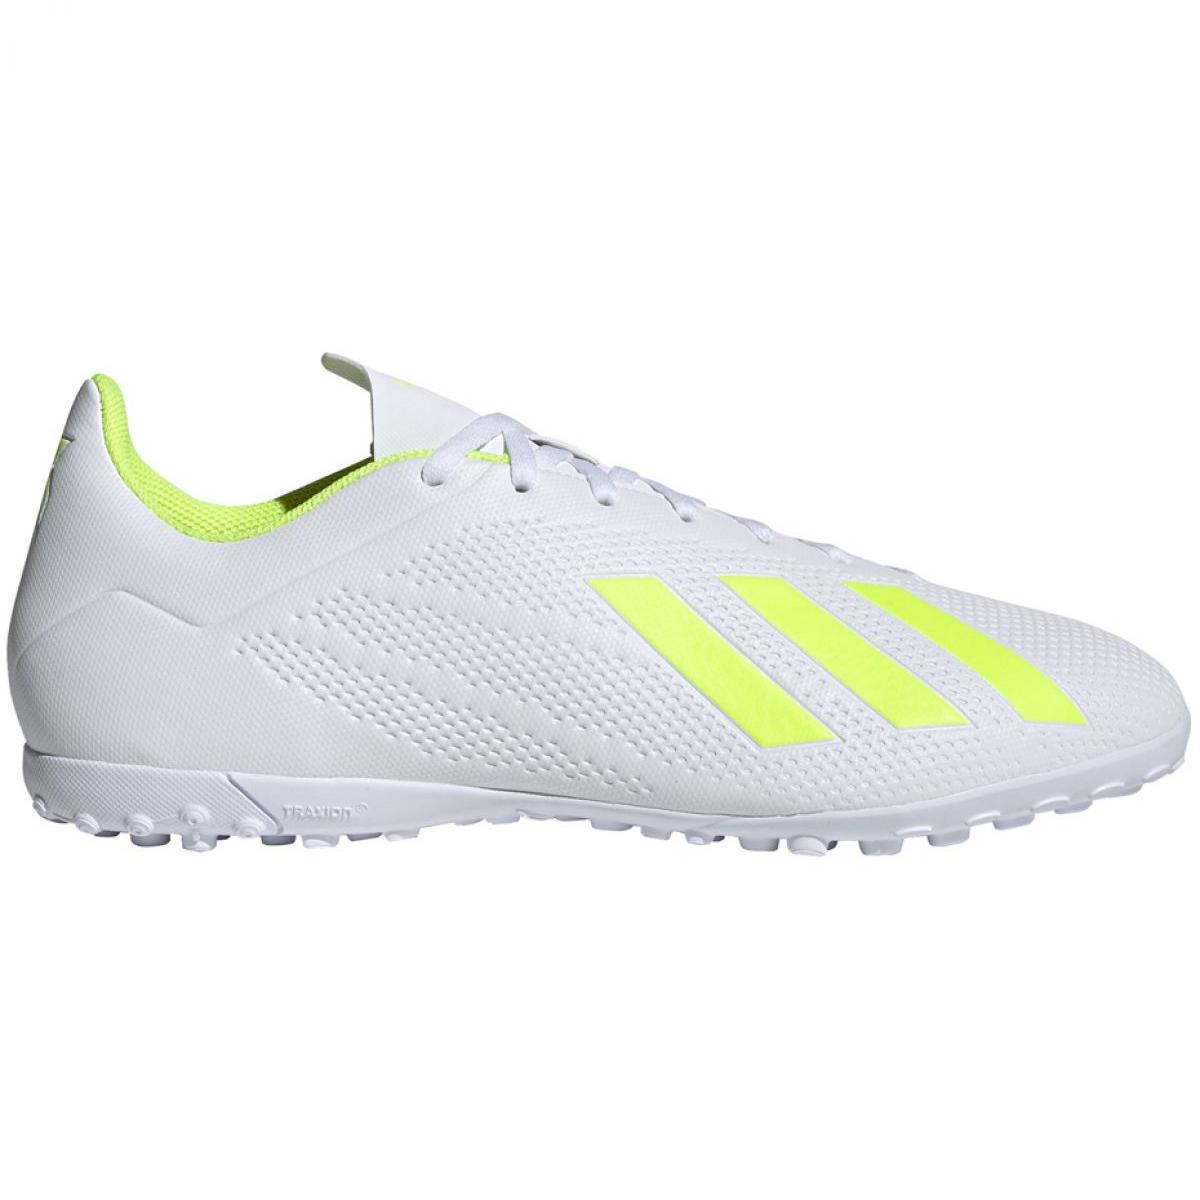 buy popular cbd37 7cca9 Football shoes adidas X 18.4 Tf M BB9414